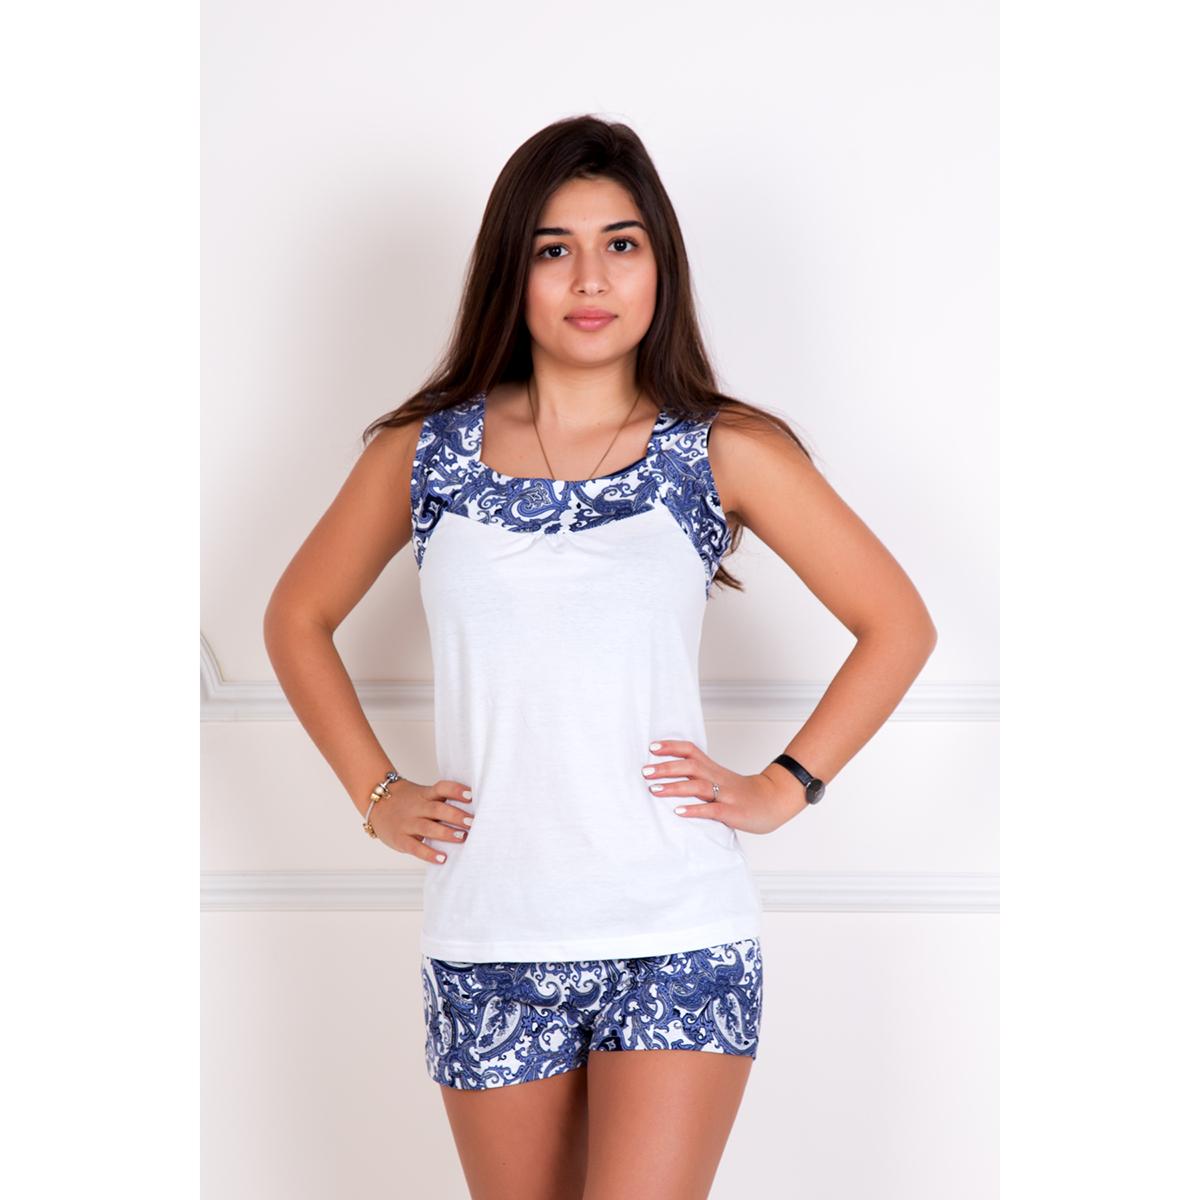 Женский костюм «Аллегра» Белый, размер 50Костюмы<br>Обхват груди:100 см<br>Обхват талии:82 см<br>Обхват бедер:108 см<br>Рост:167 см<br><br>Тип: Жен. костюм<br>Размер: 50<br>Материал: Кулирка